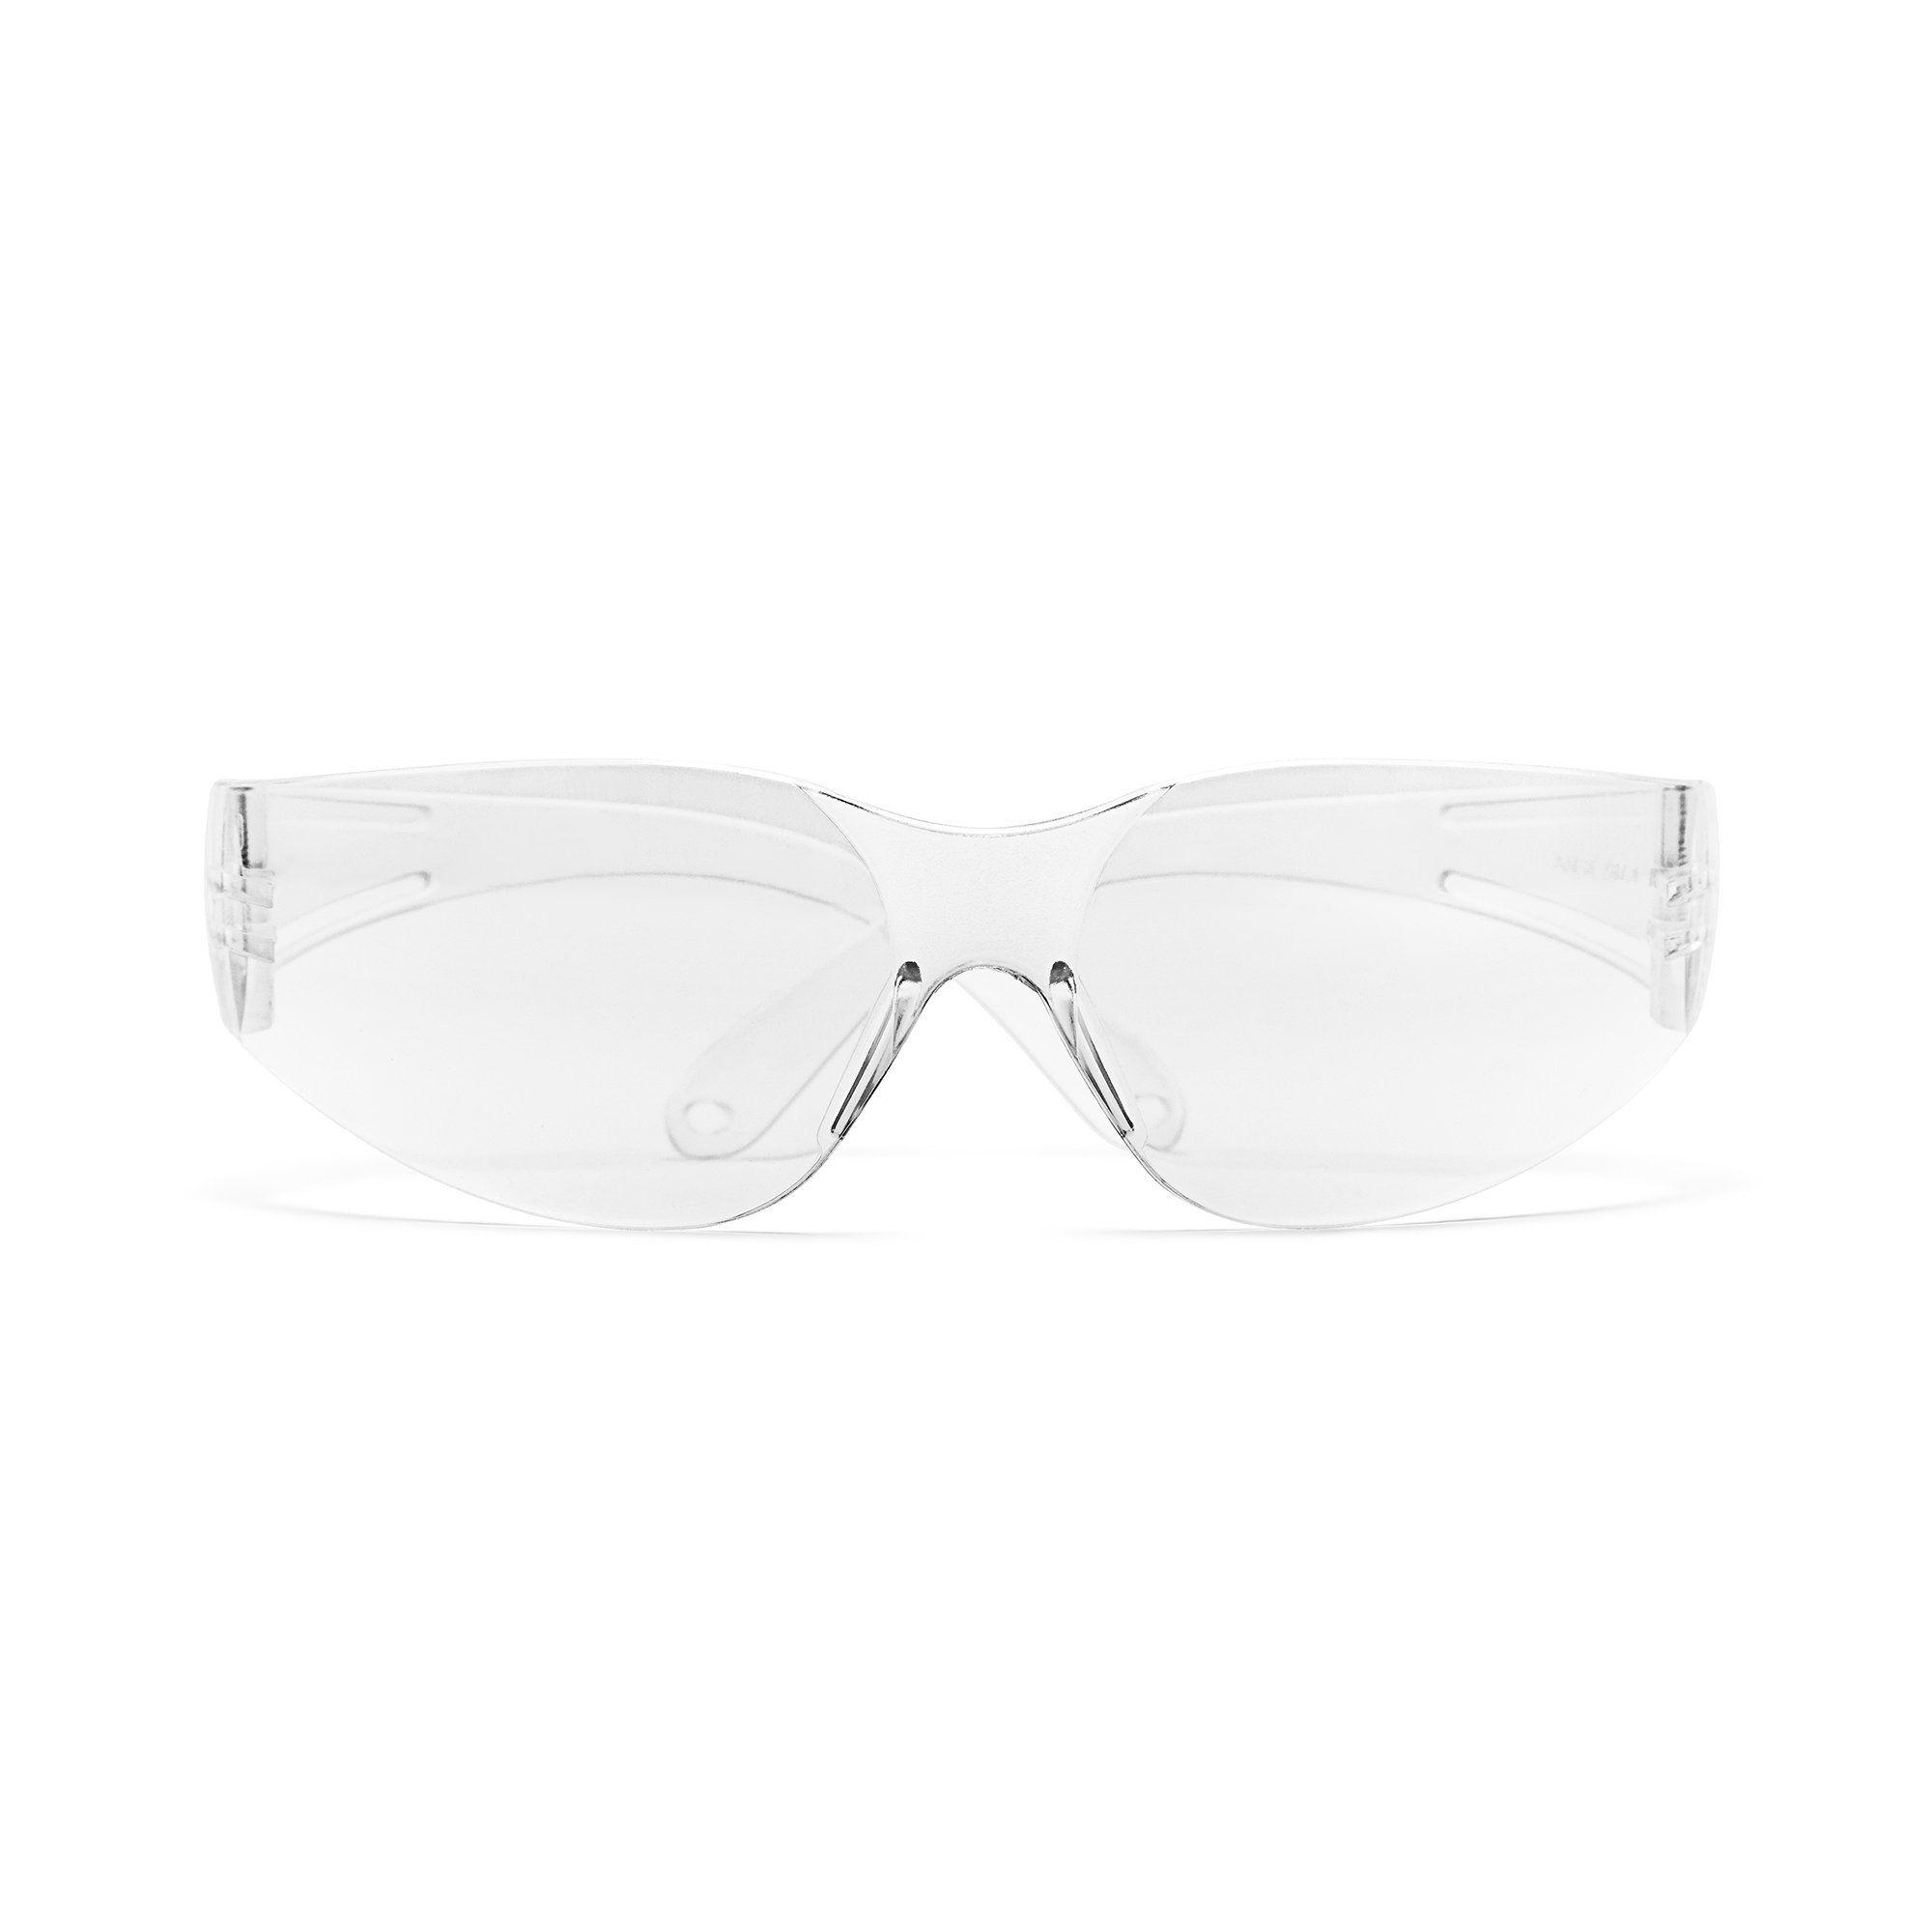 KMD PRO OptiFlex Safety Glasses z87.1 Certified Eye